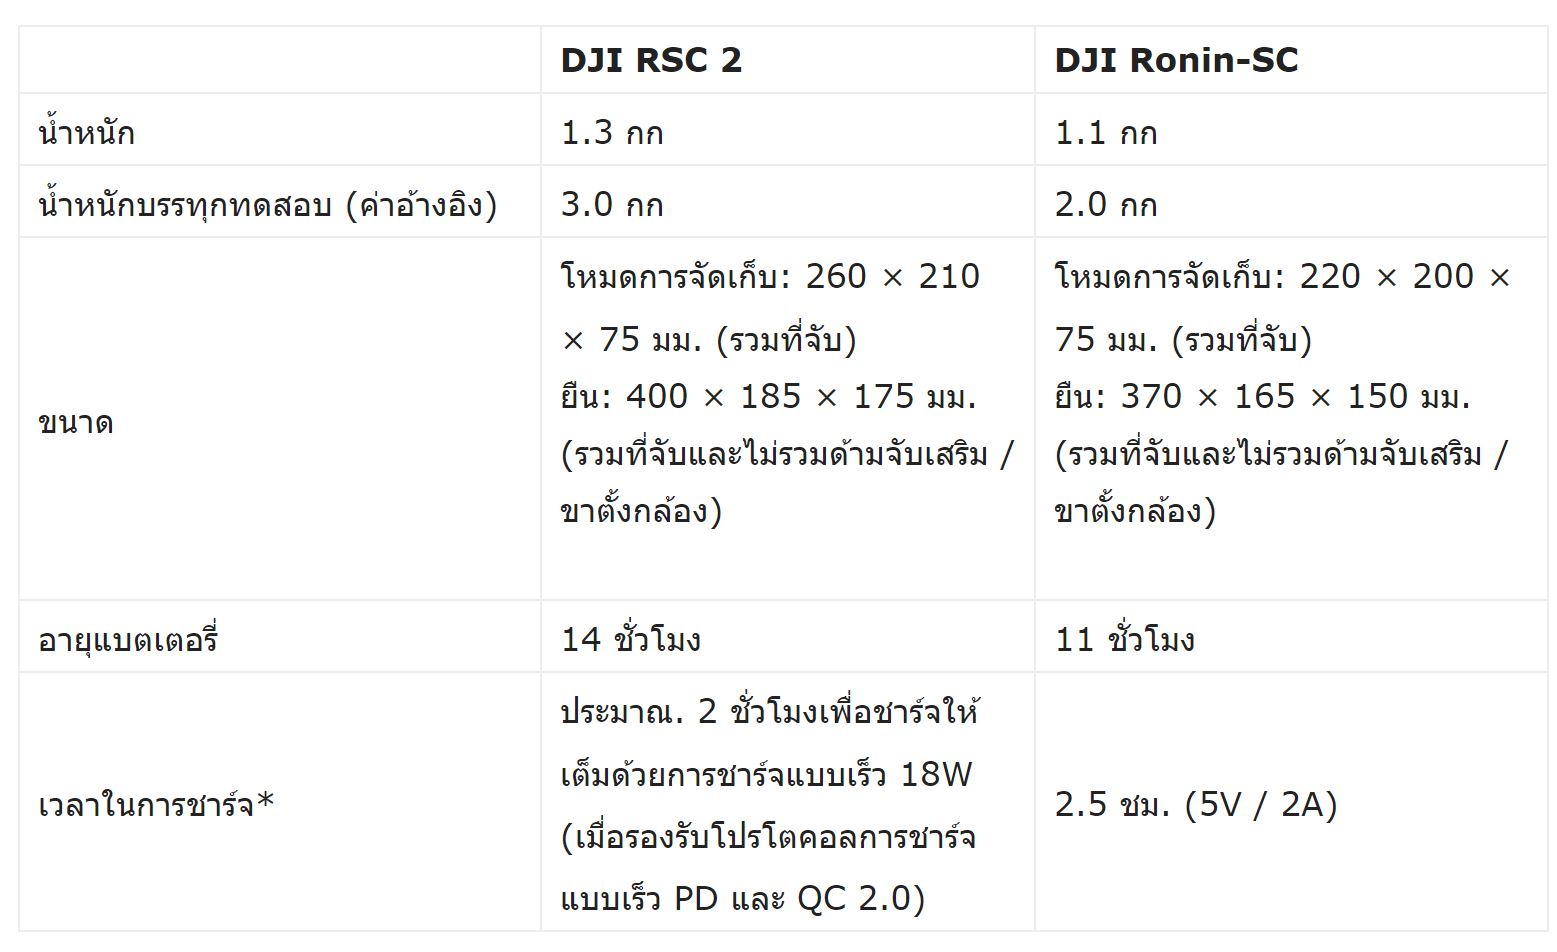 compare DJI RSC 2 vs Ronin SC